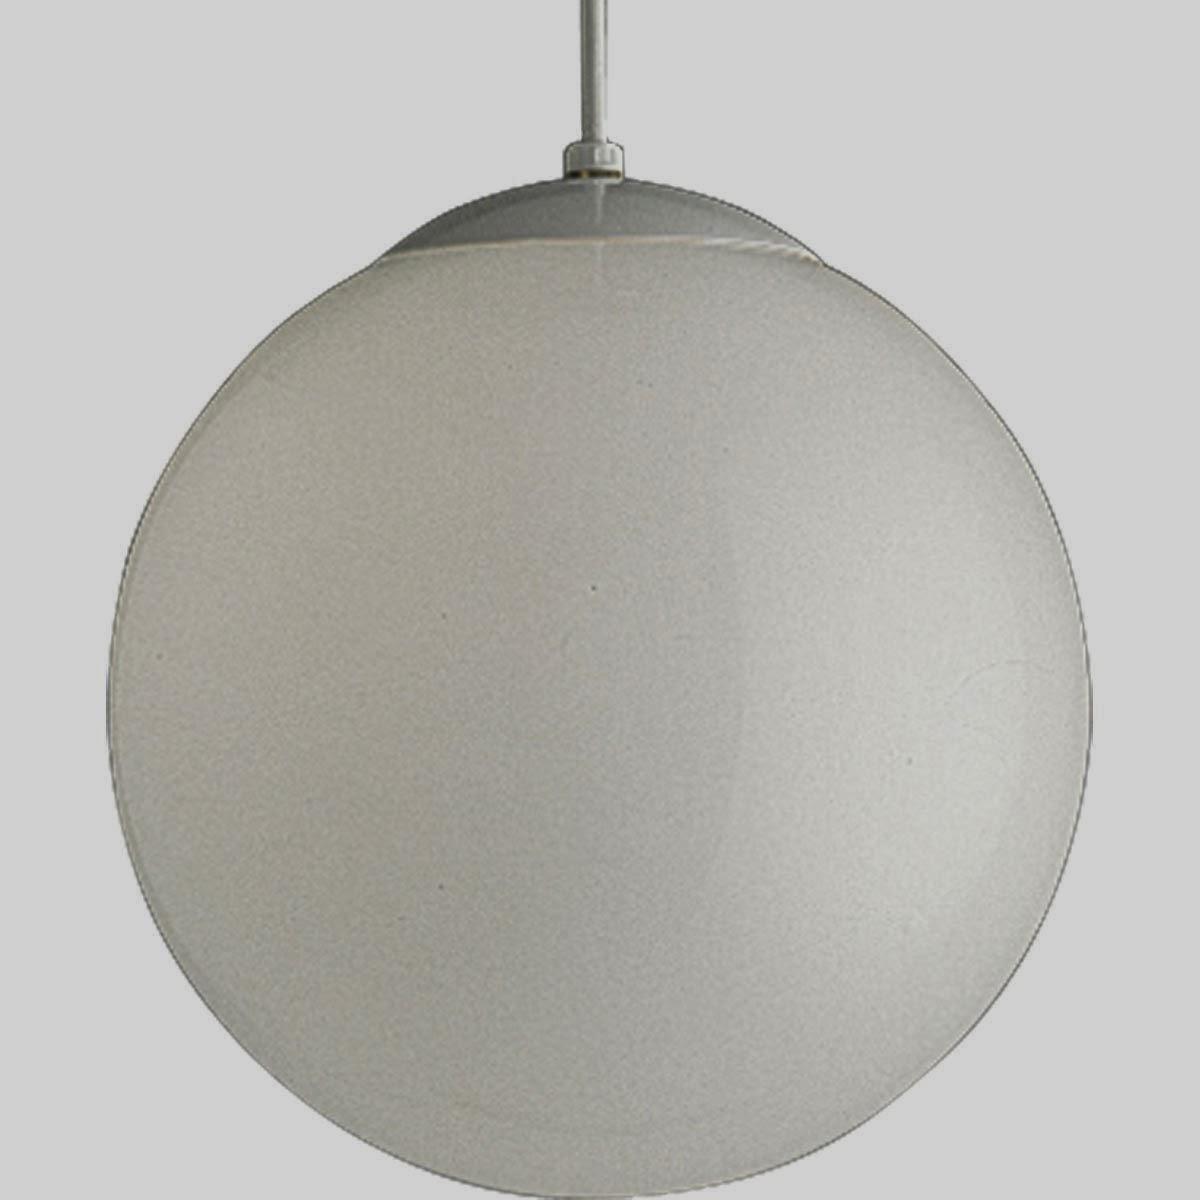 Eichler Globe Lighting. globe lights fogmodern. west elm